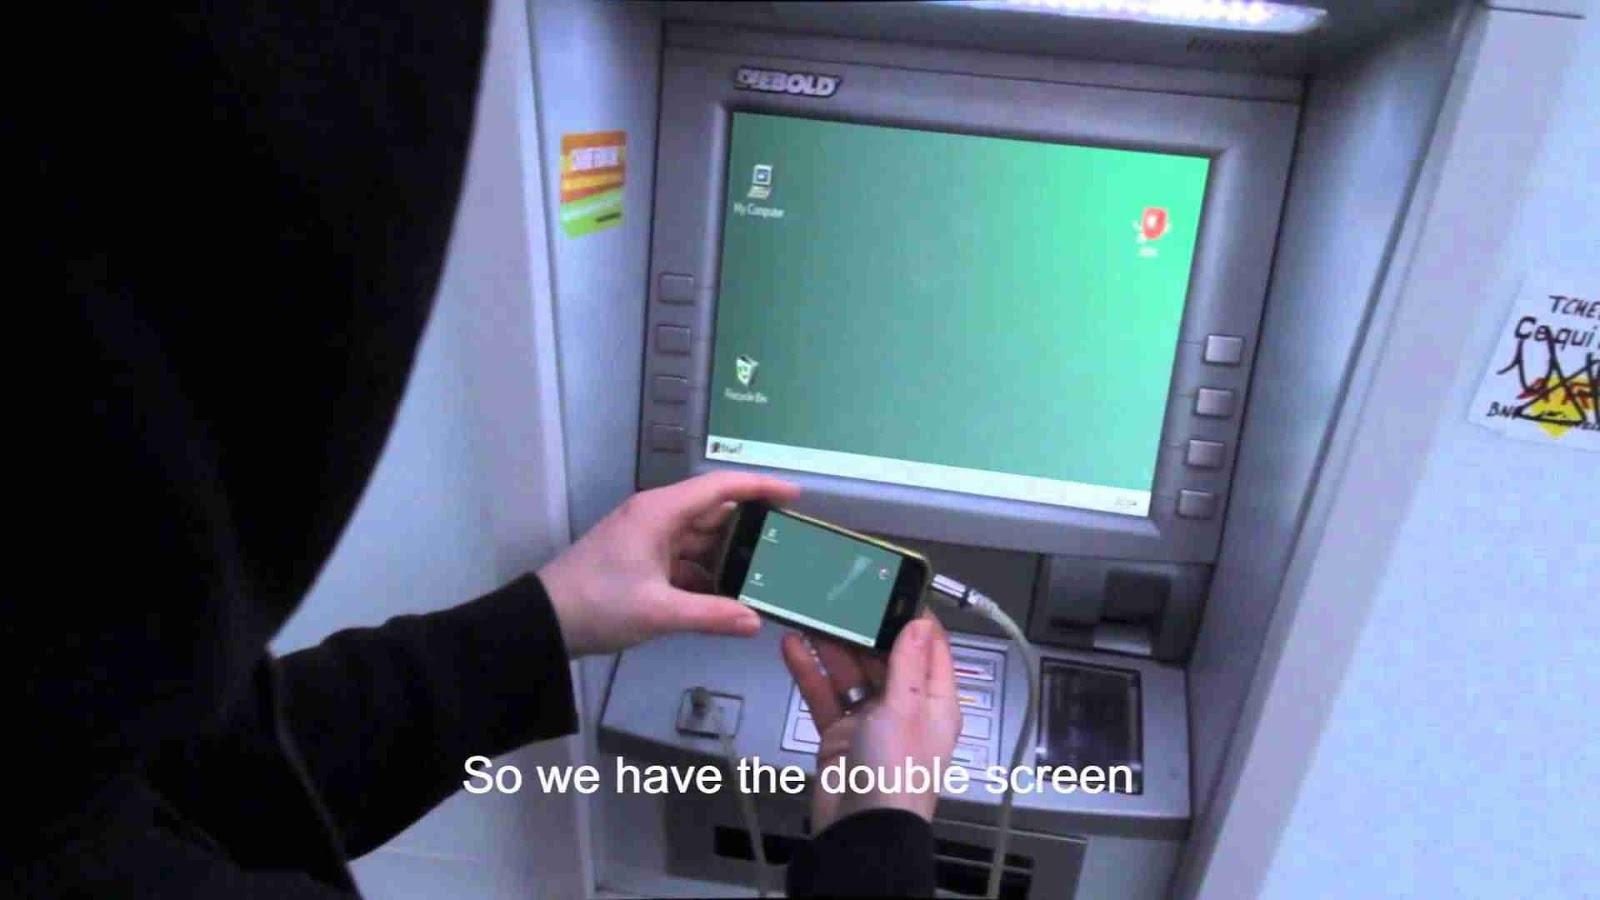 3 Cara Bobol Mesin ATM   Hacker Trick - ArtikelCara10 nOOb